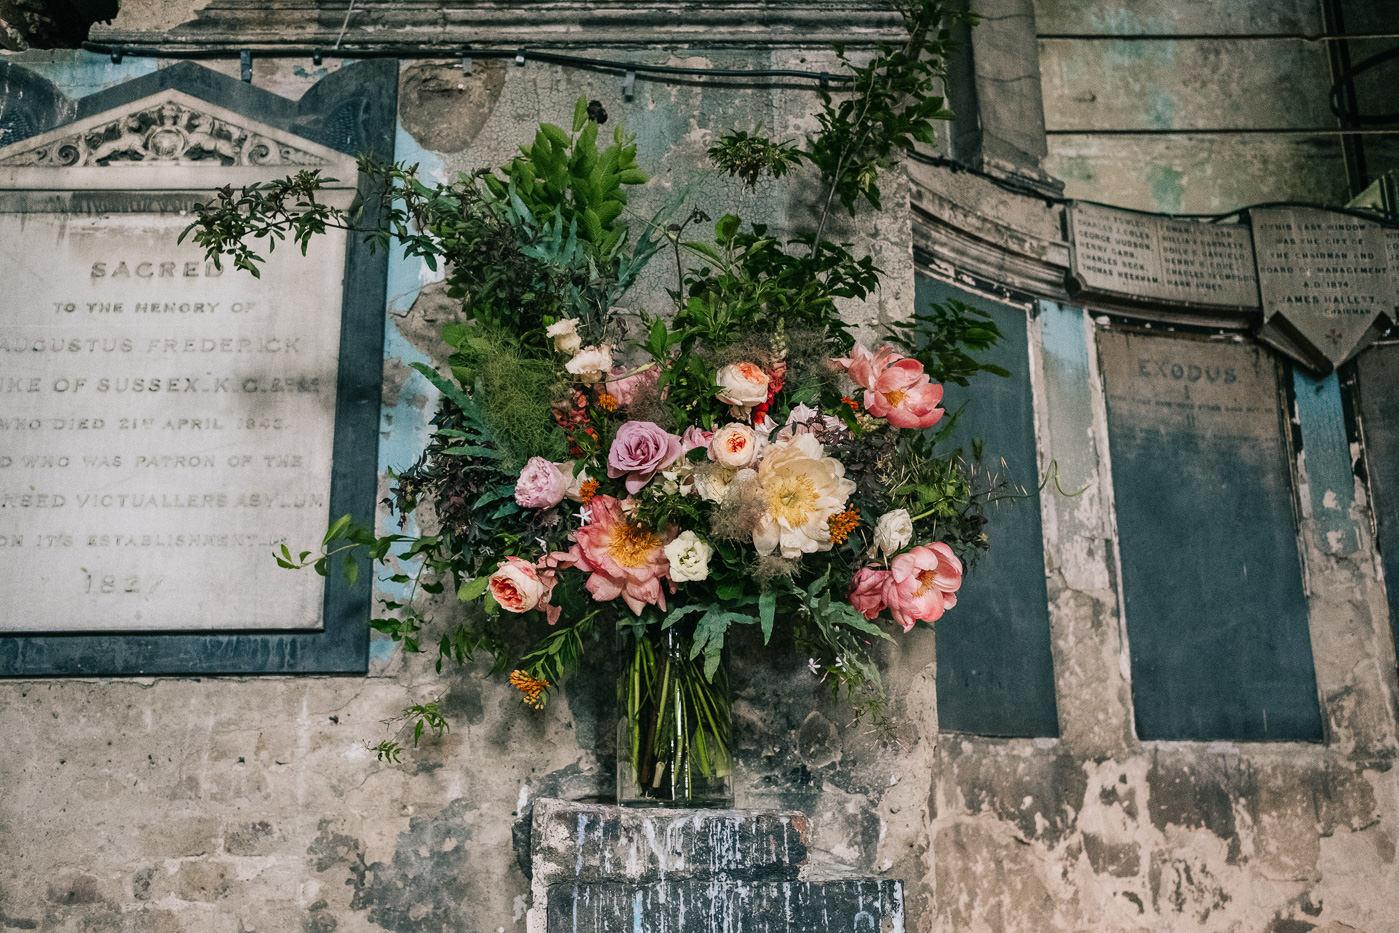 oversized alternative wedding flowers asylum peckham brockwell lido